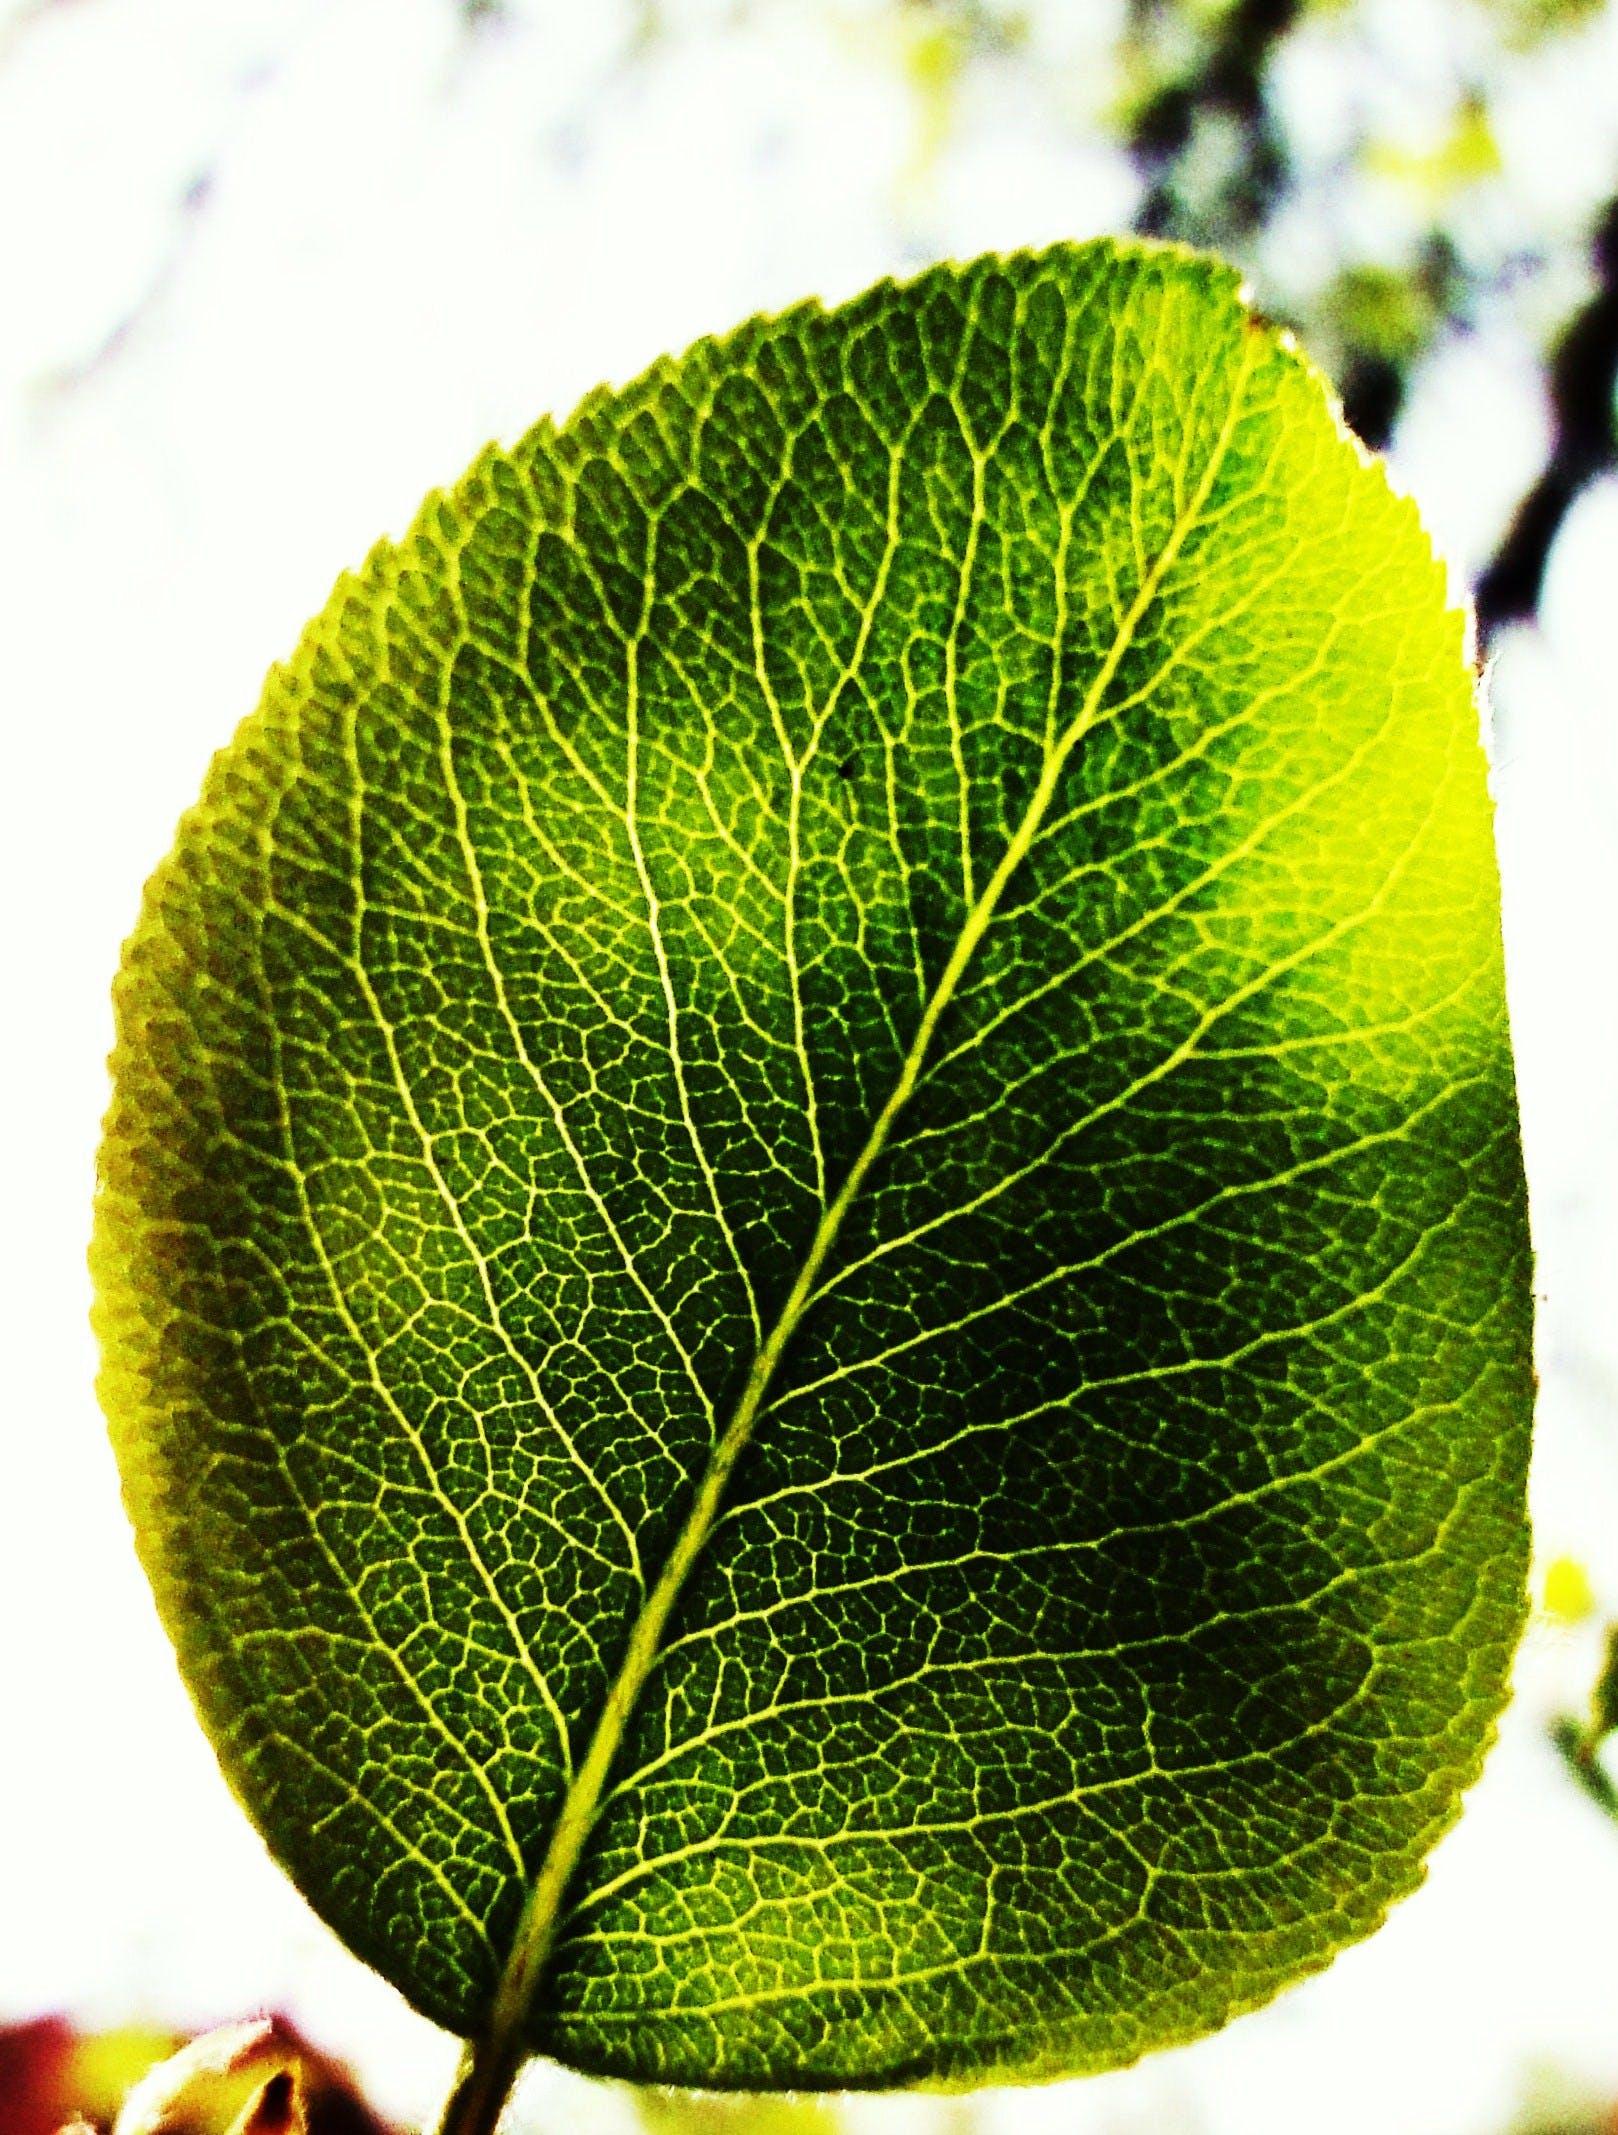 Free stock photo of sun, leaf, green